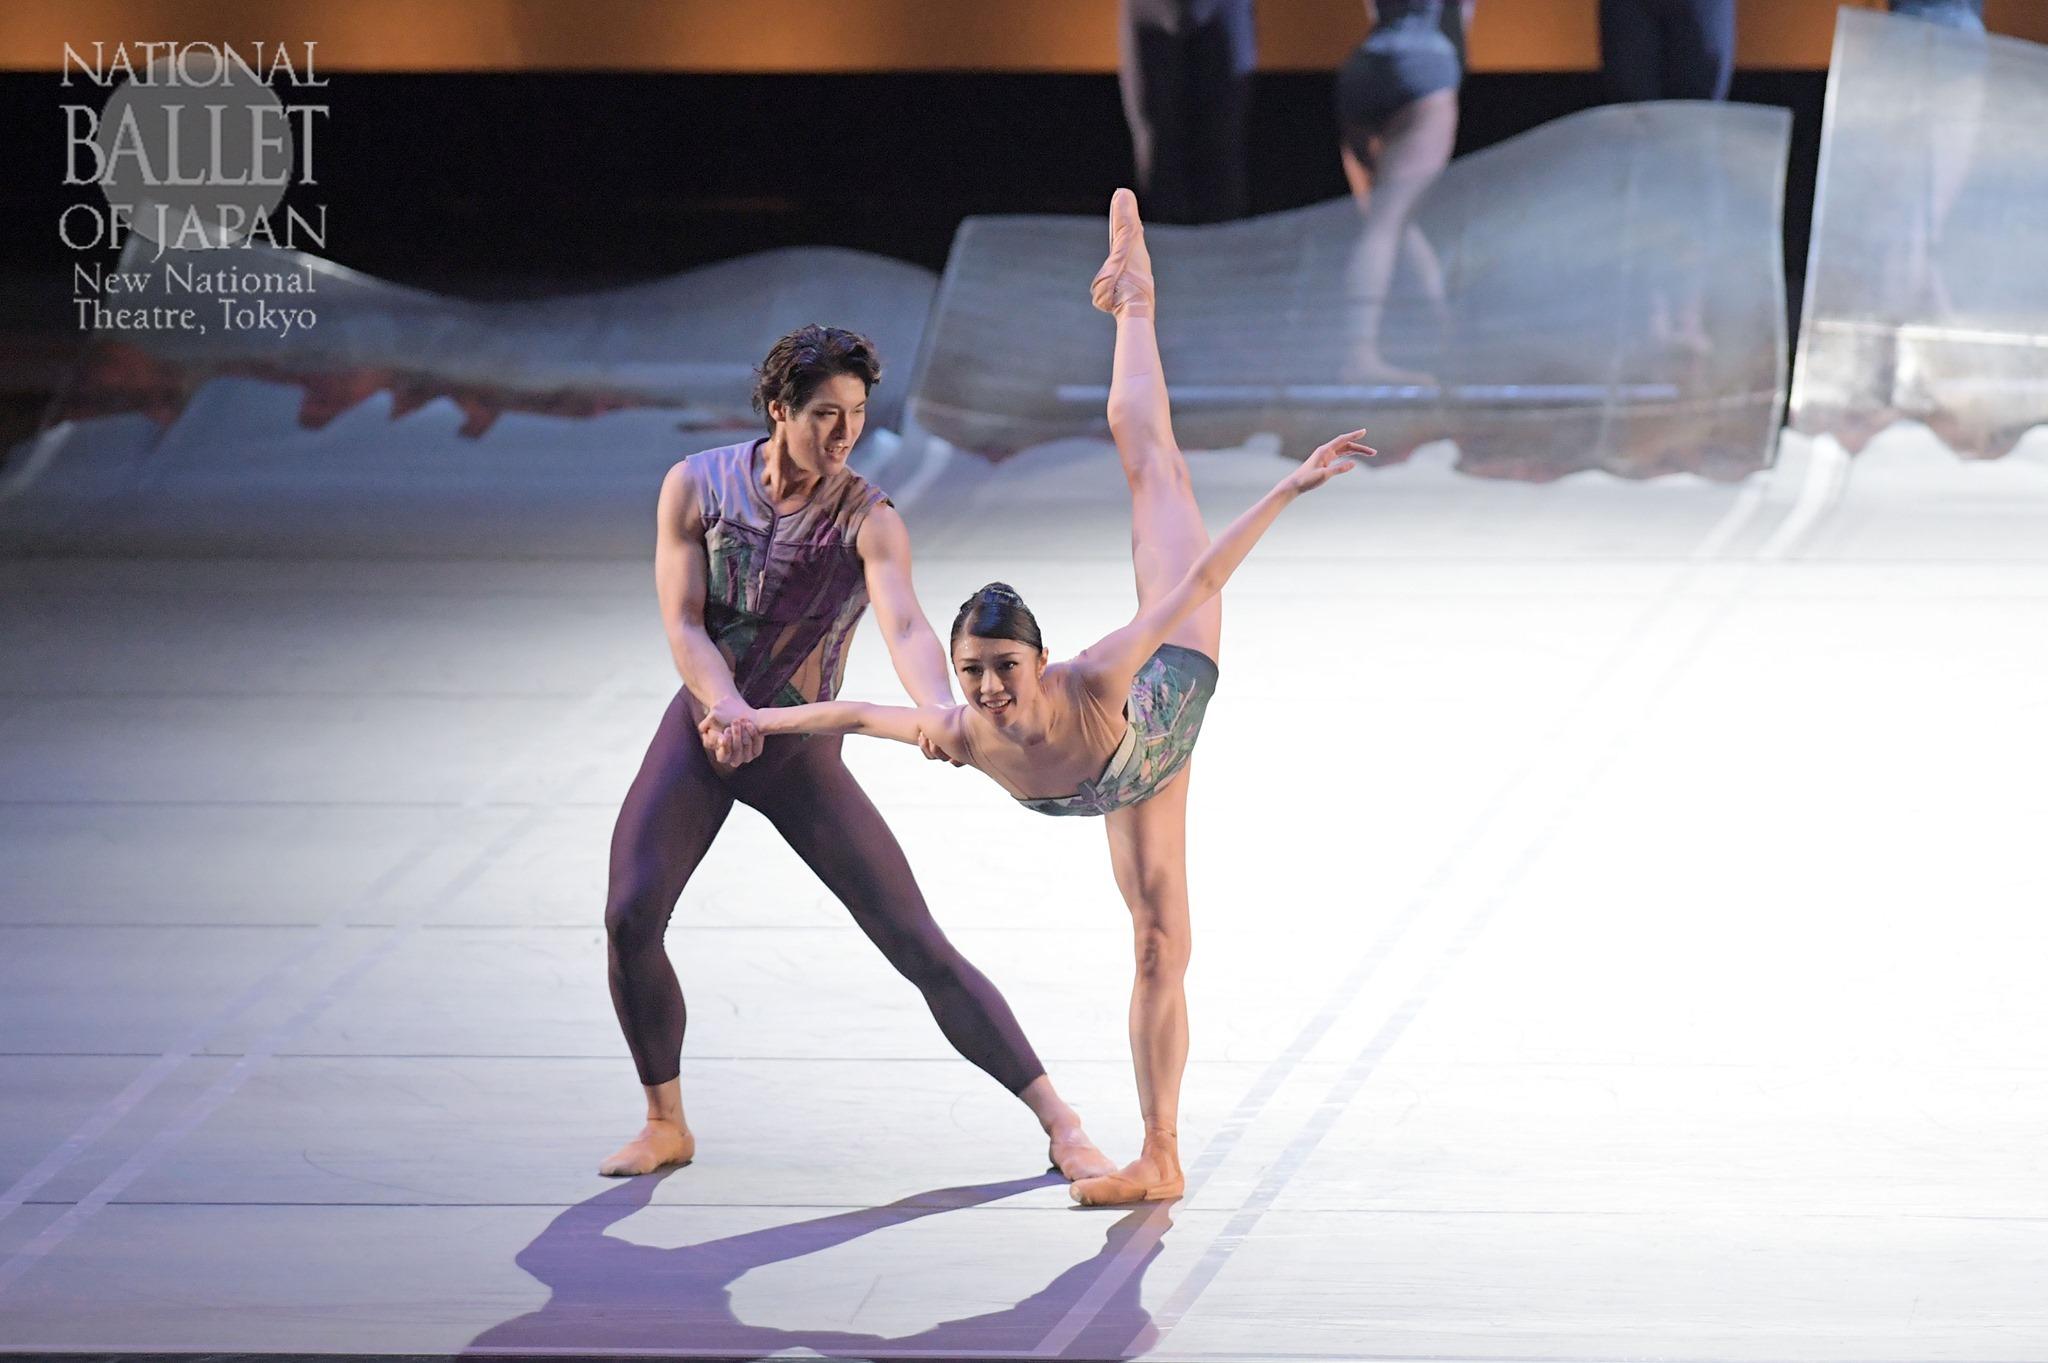 『DGV Danse à Grande Vitesse ©』寺田亜沙子、福岡雄大(撮影:鹿摩隆司/写真提供:新国立劇場)